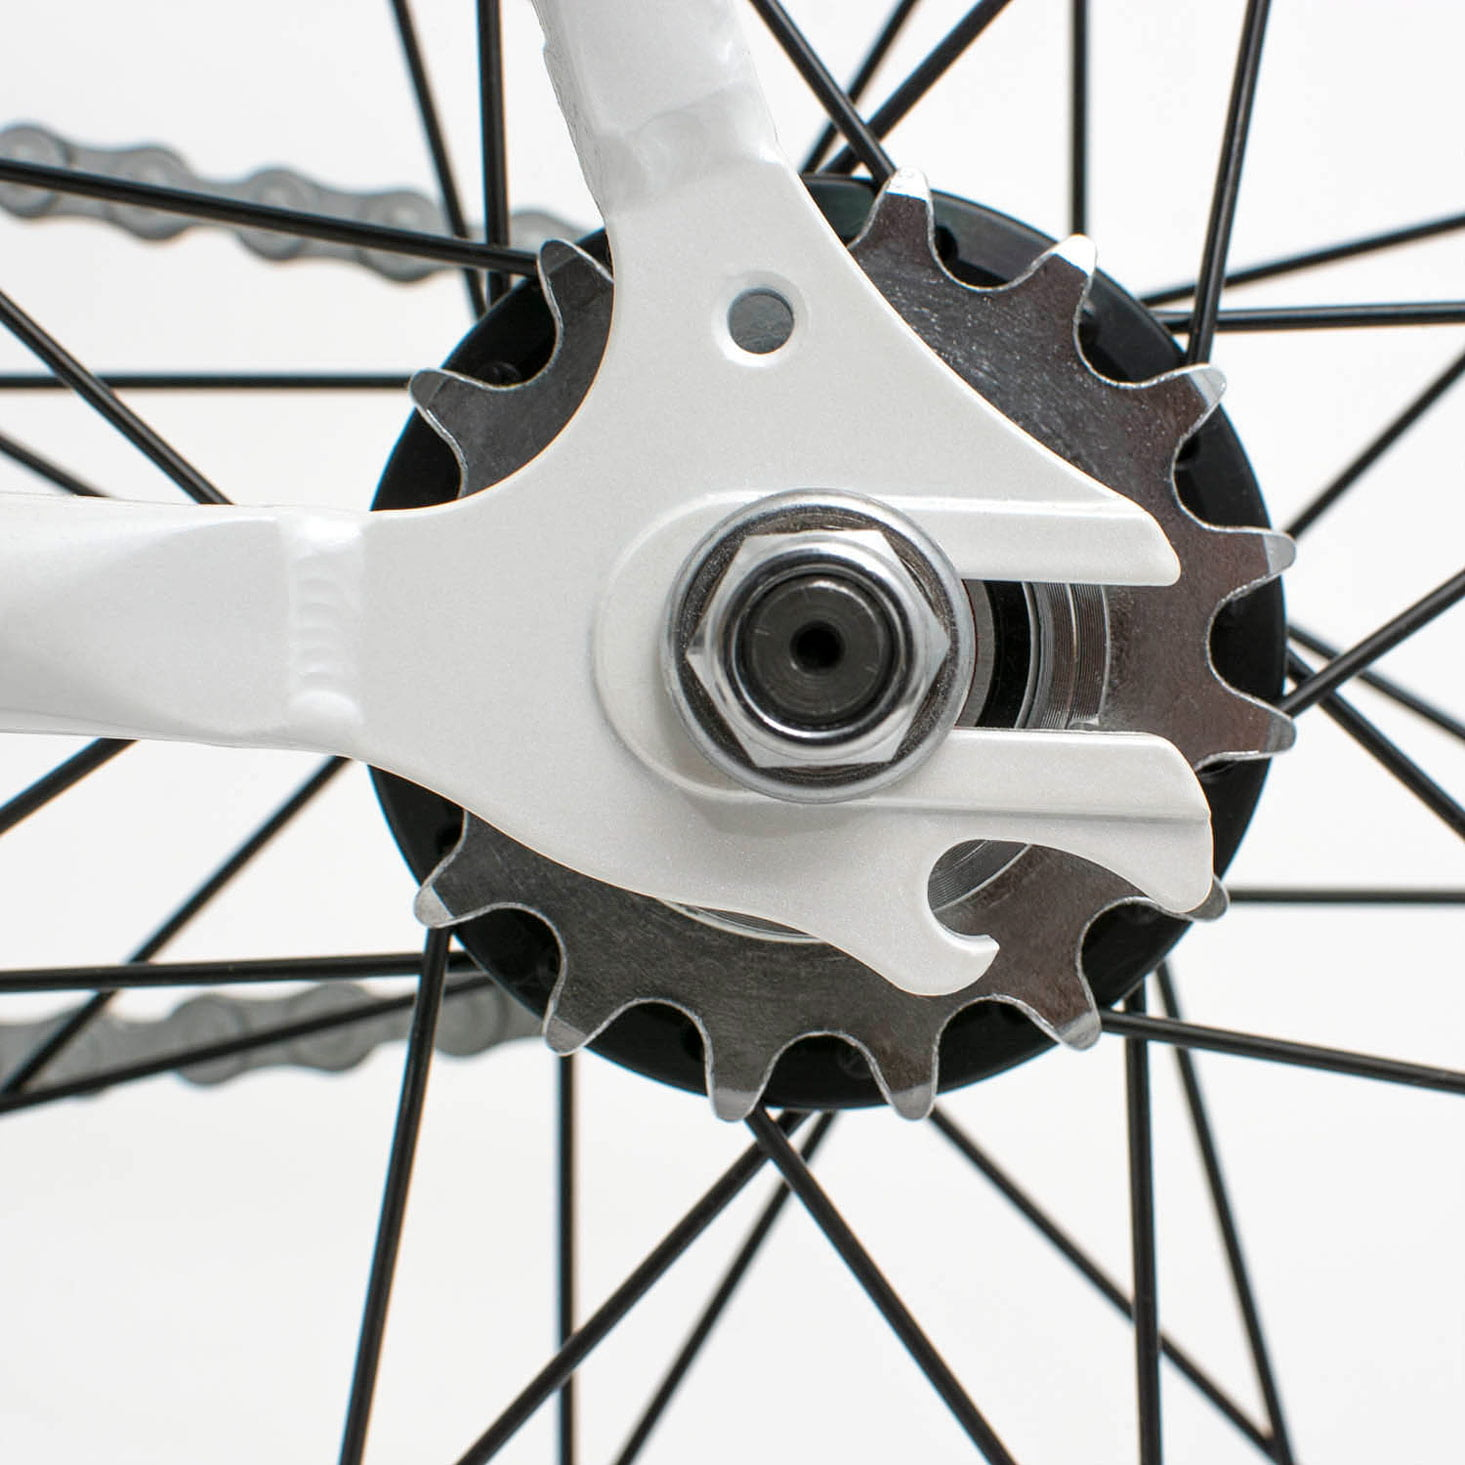 Landyachtz_Spitfire_White_Single_Speed_Bikes_3_DSC4847